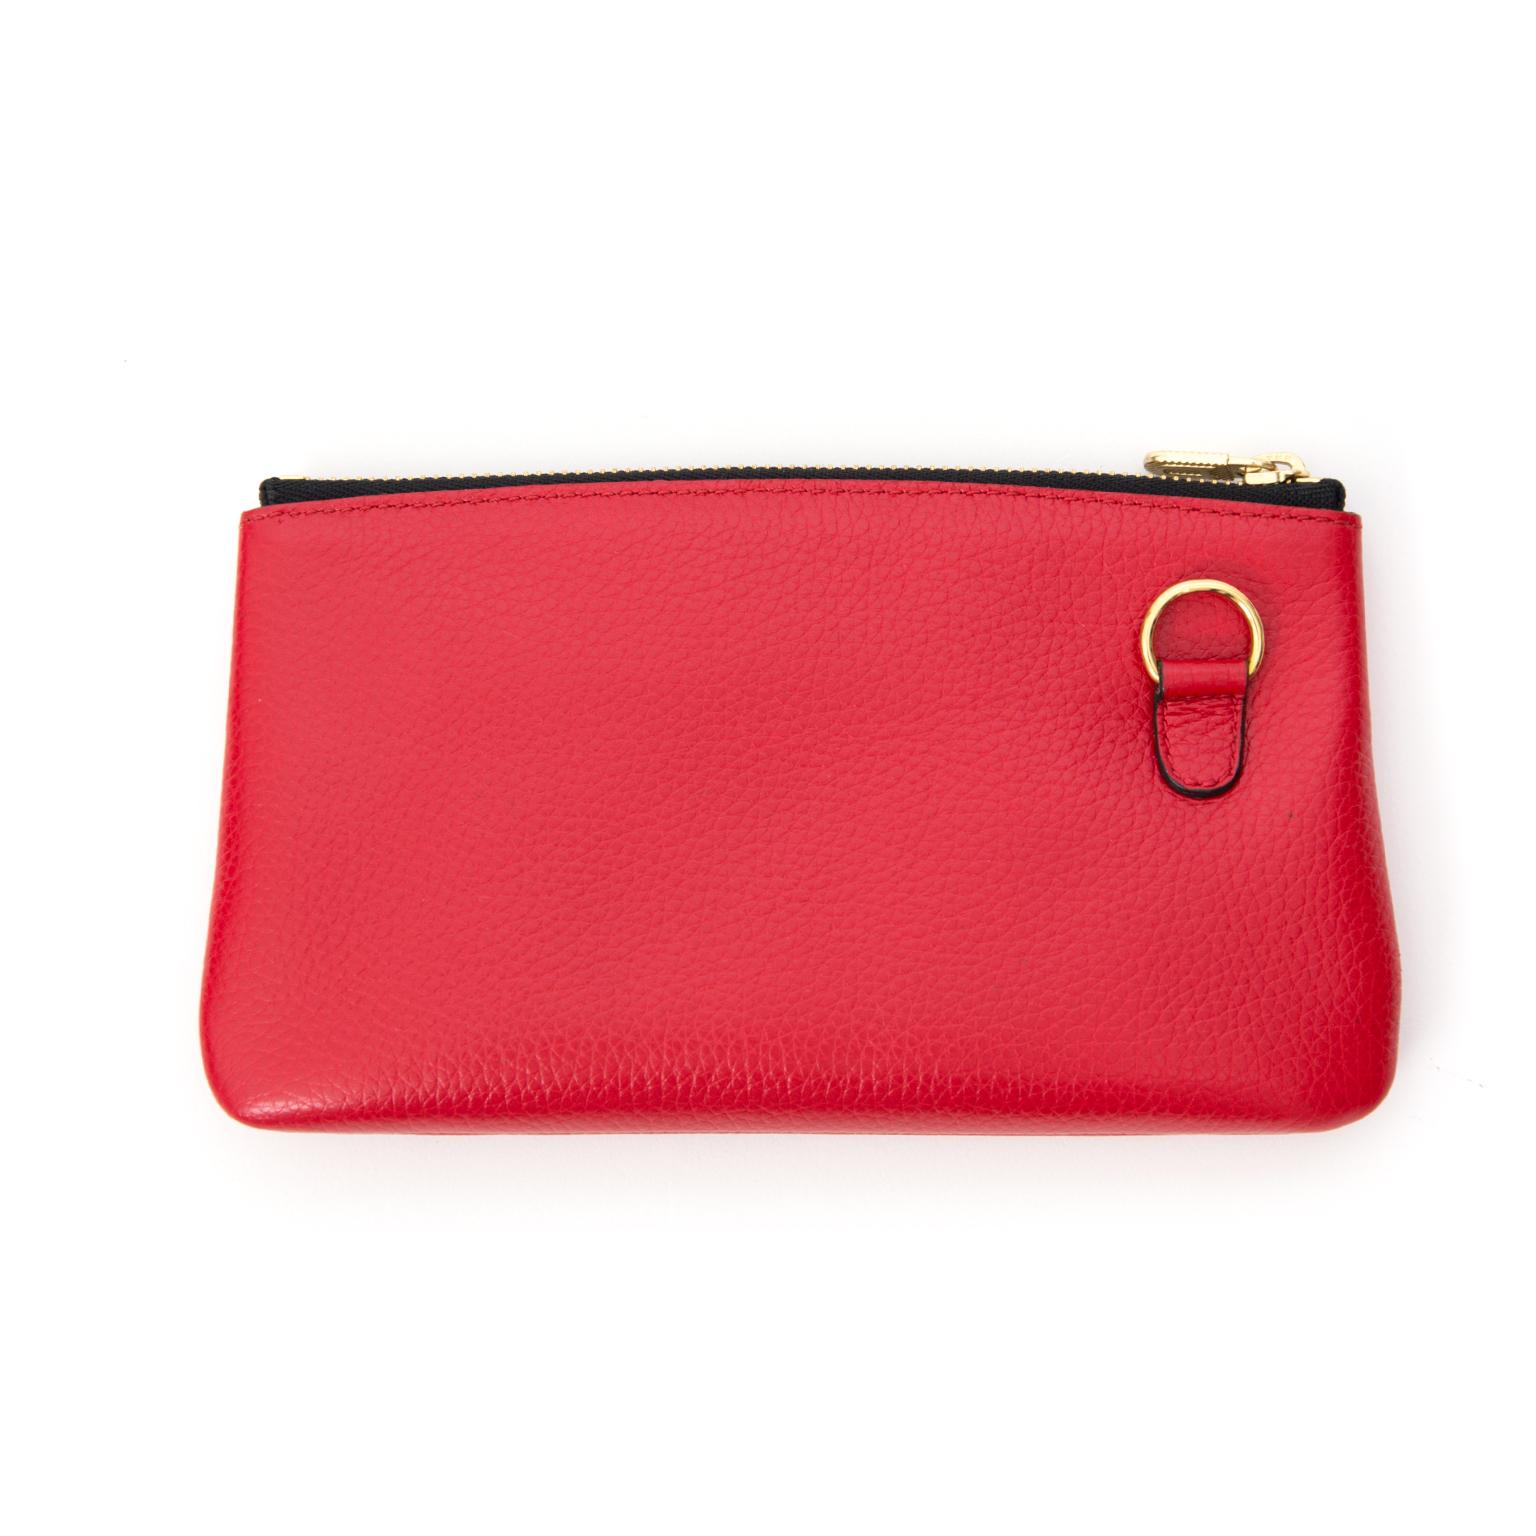 Delvaux rode Pochette aan de beste prijs bij Labellov. Safe and 100% authentic.